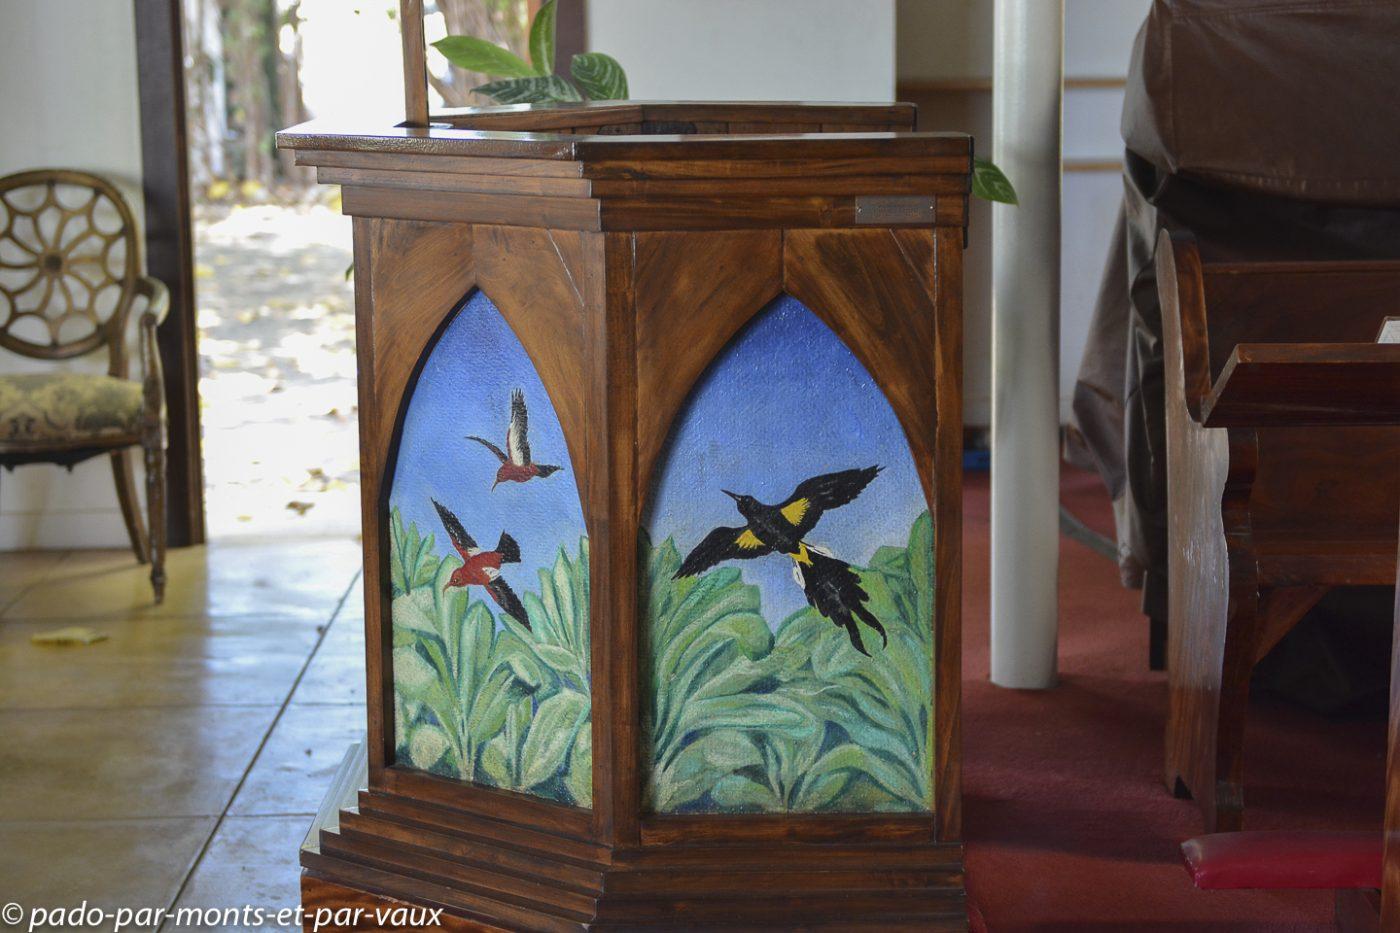 Maui -  Lahaina - Holy innocent's episcopal church